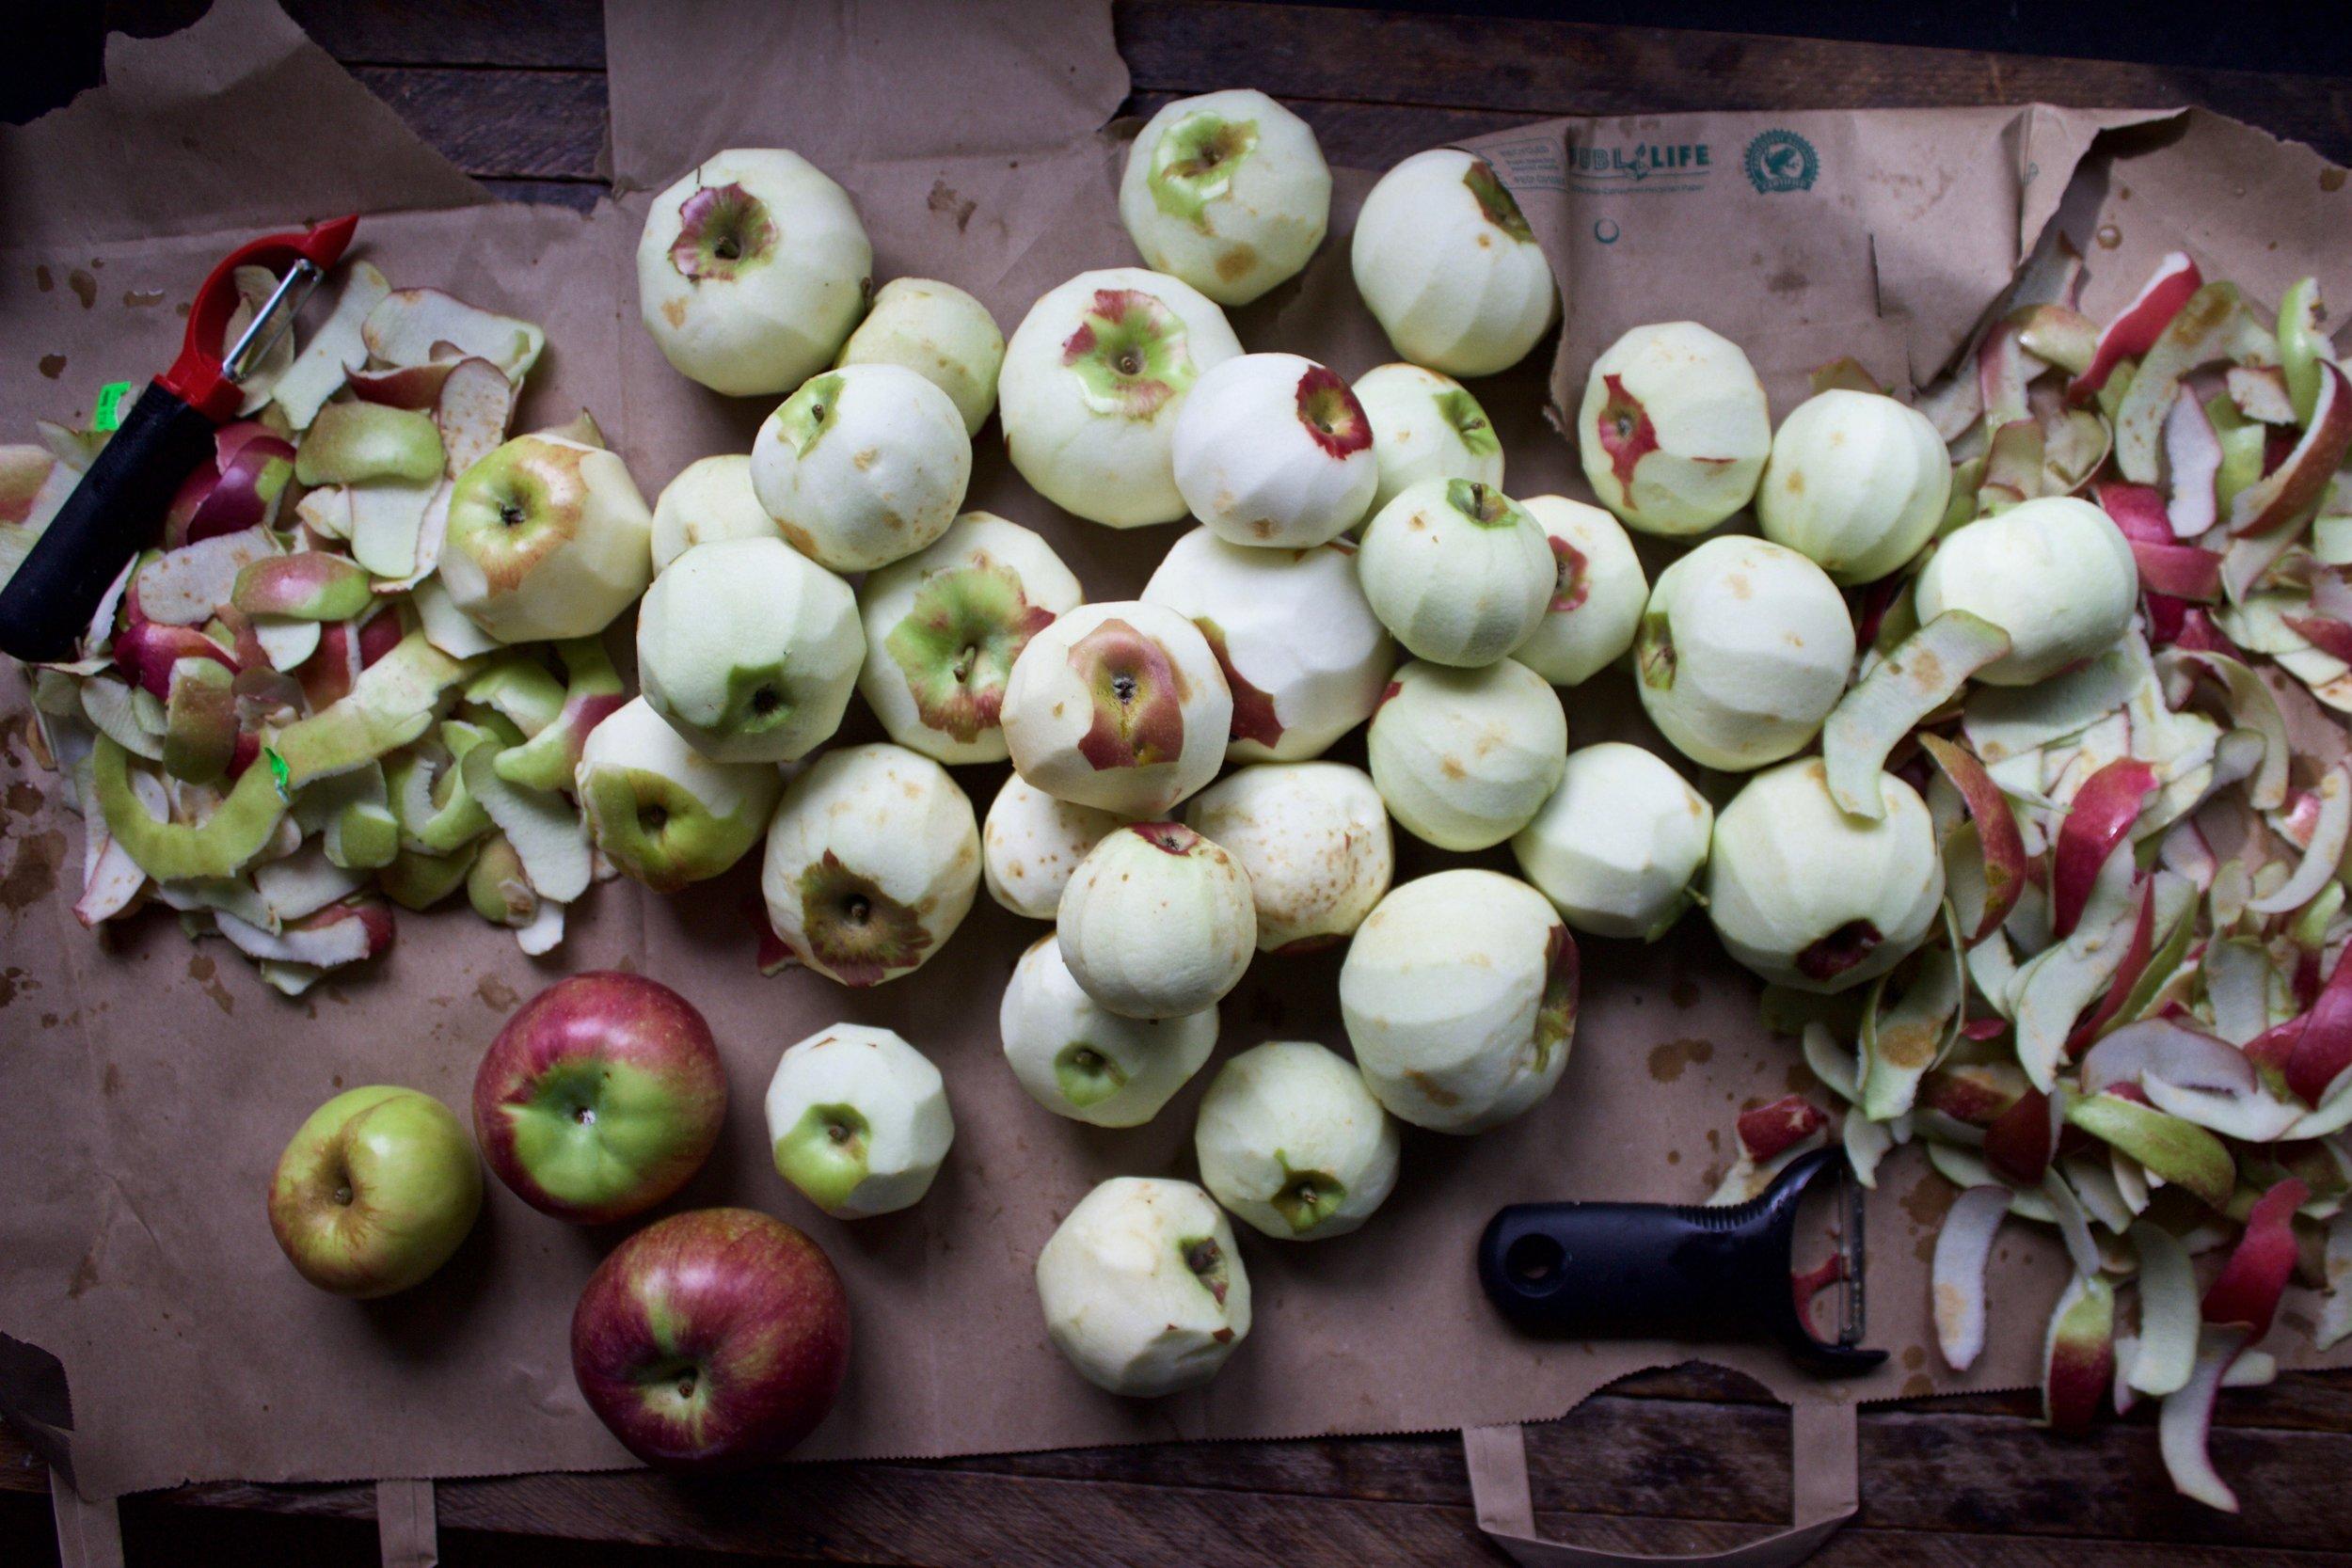 macintosh apples